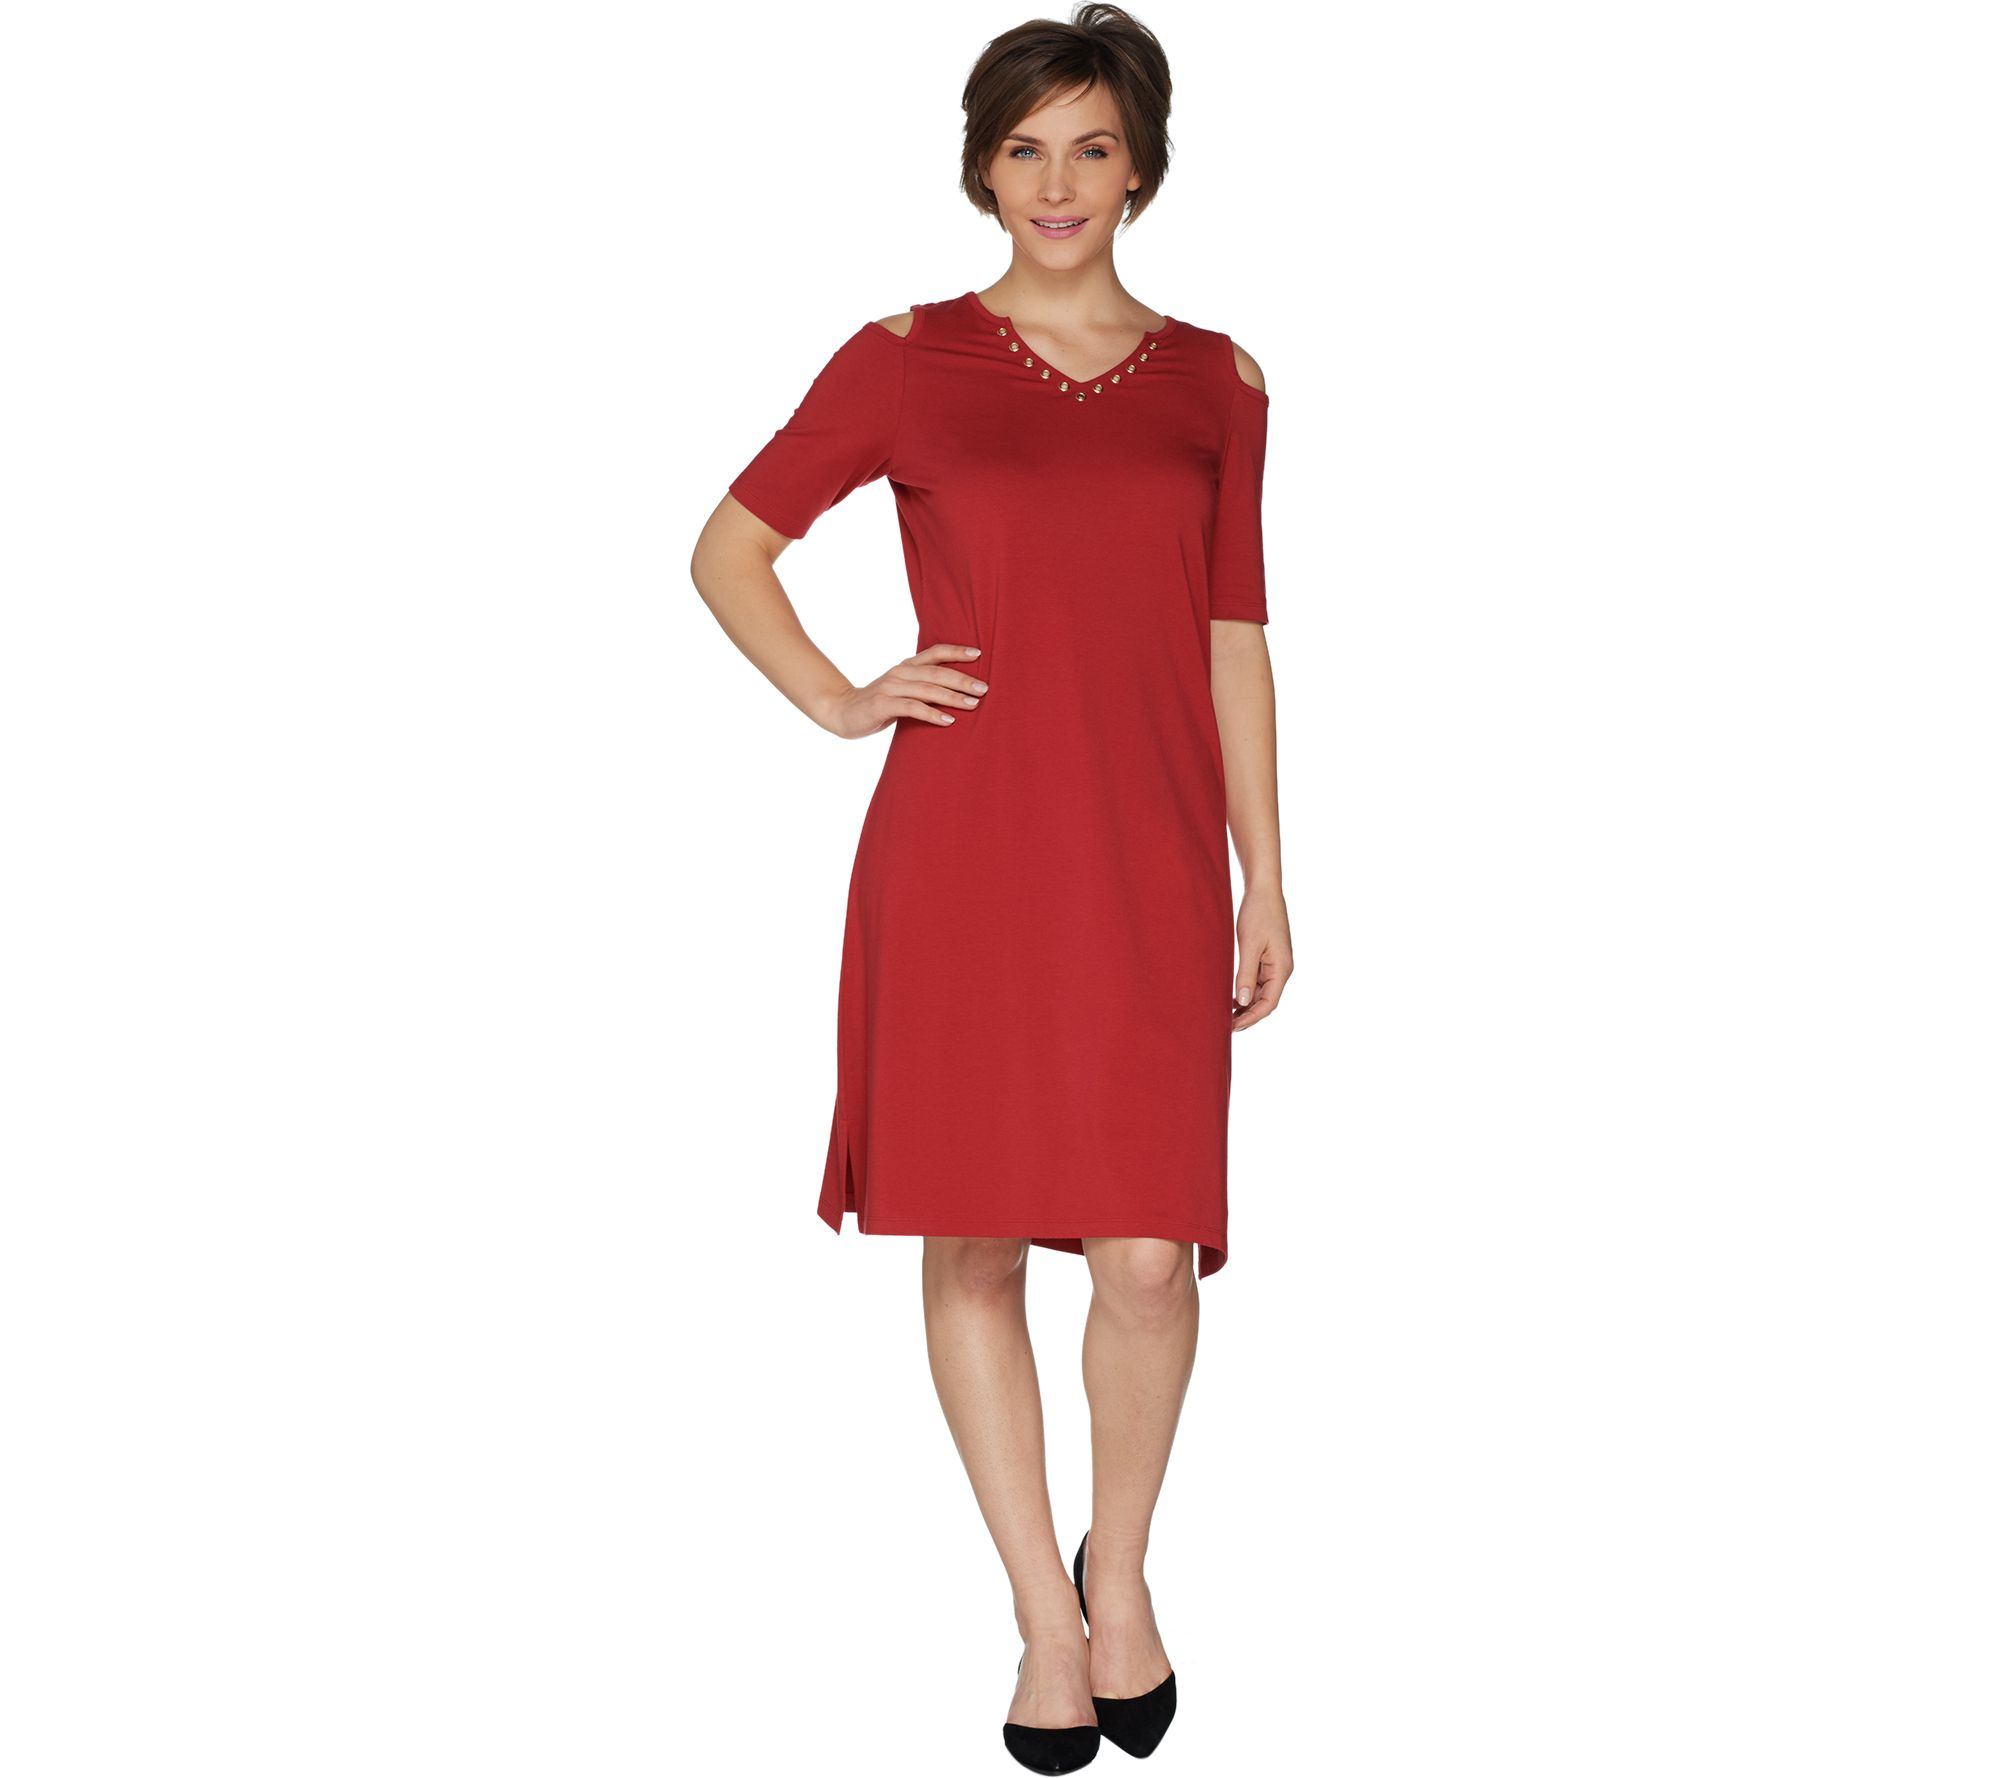 dresses u2014 fashion u2014 qvc com